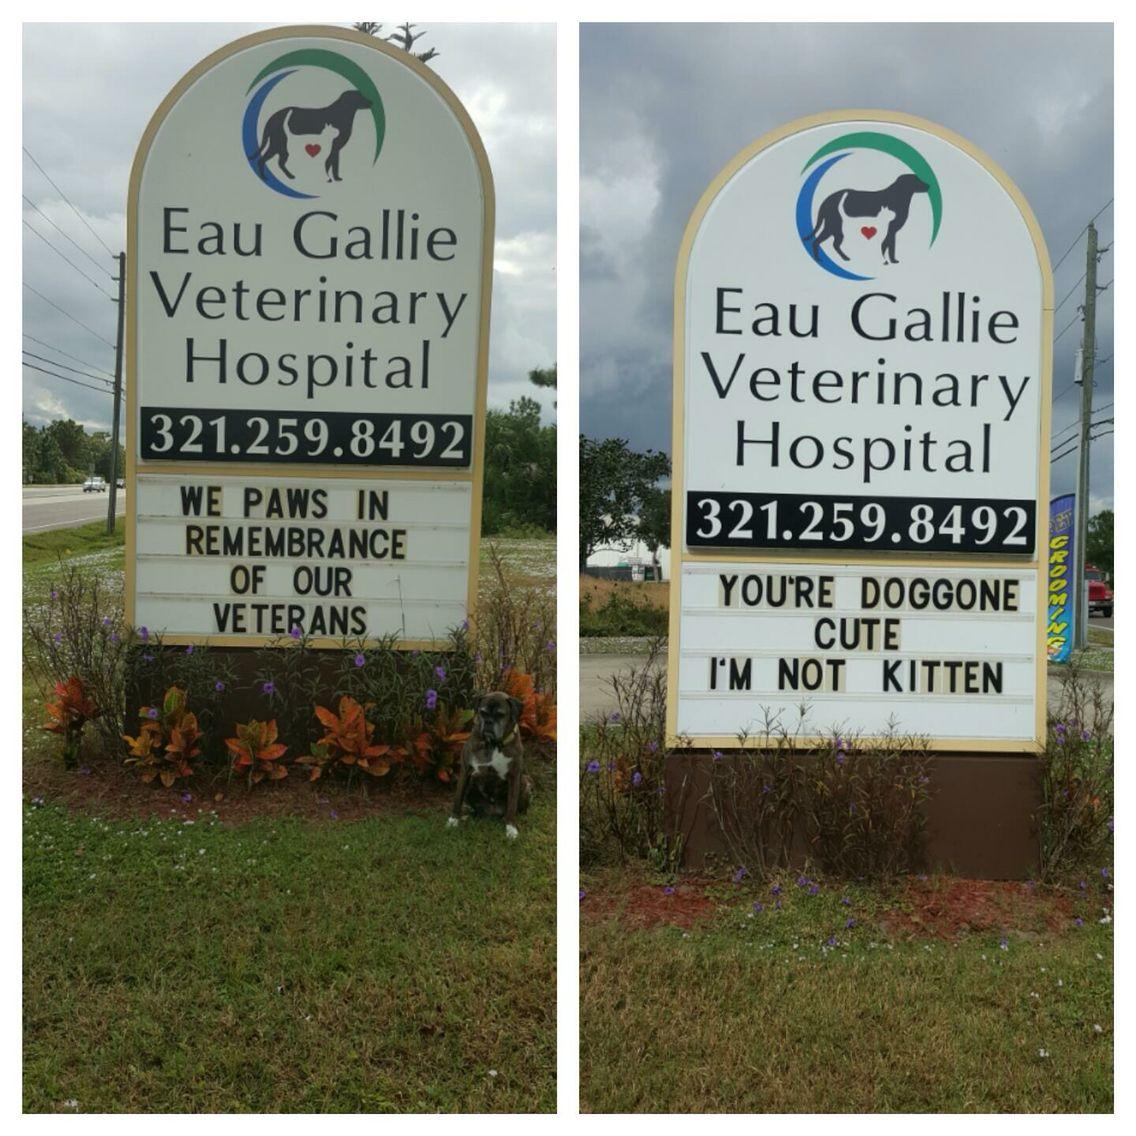 Eau Gallie Vet Clinic Melbourne Florida Vet Clinics Veterinary Humor Vets